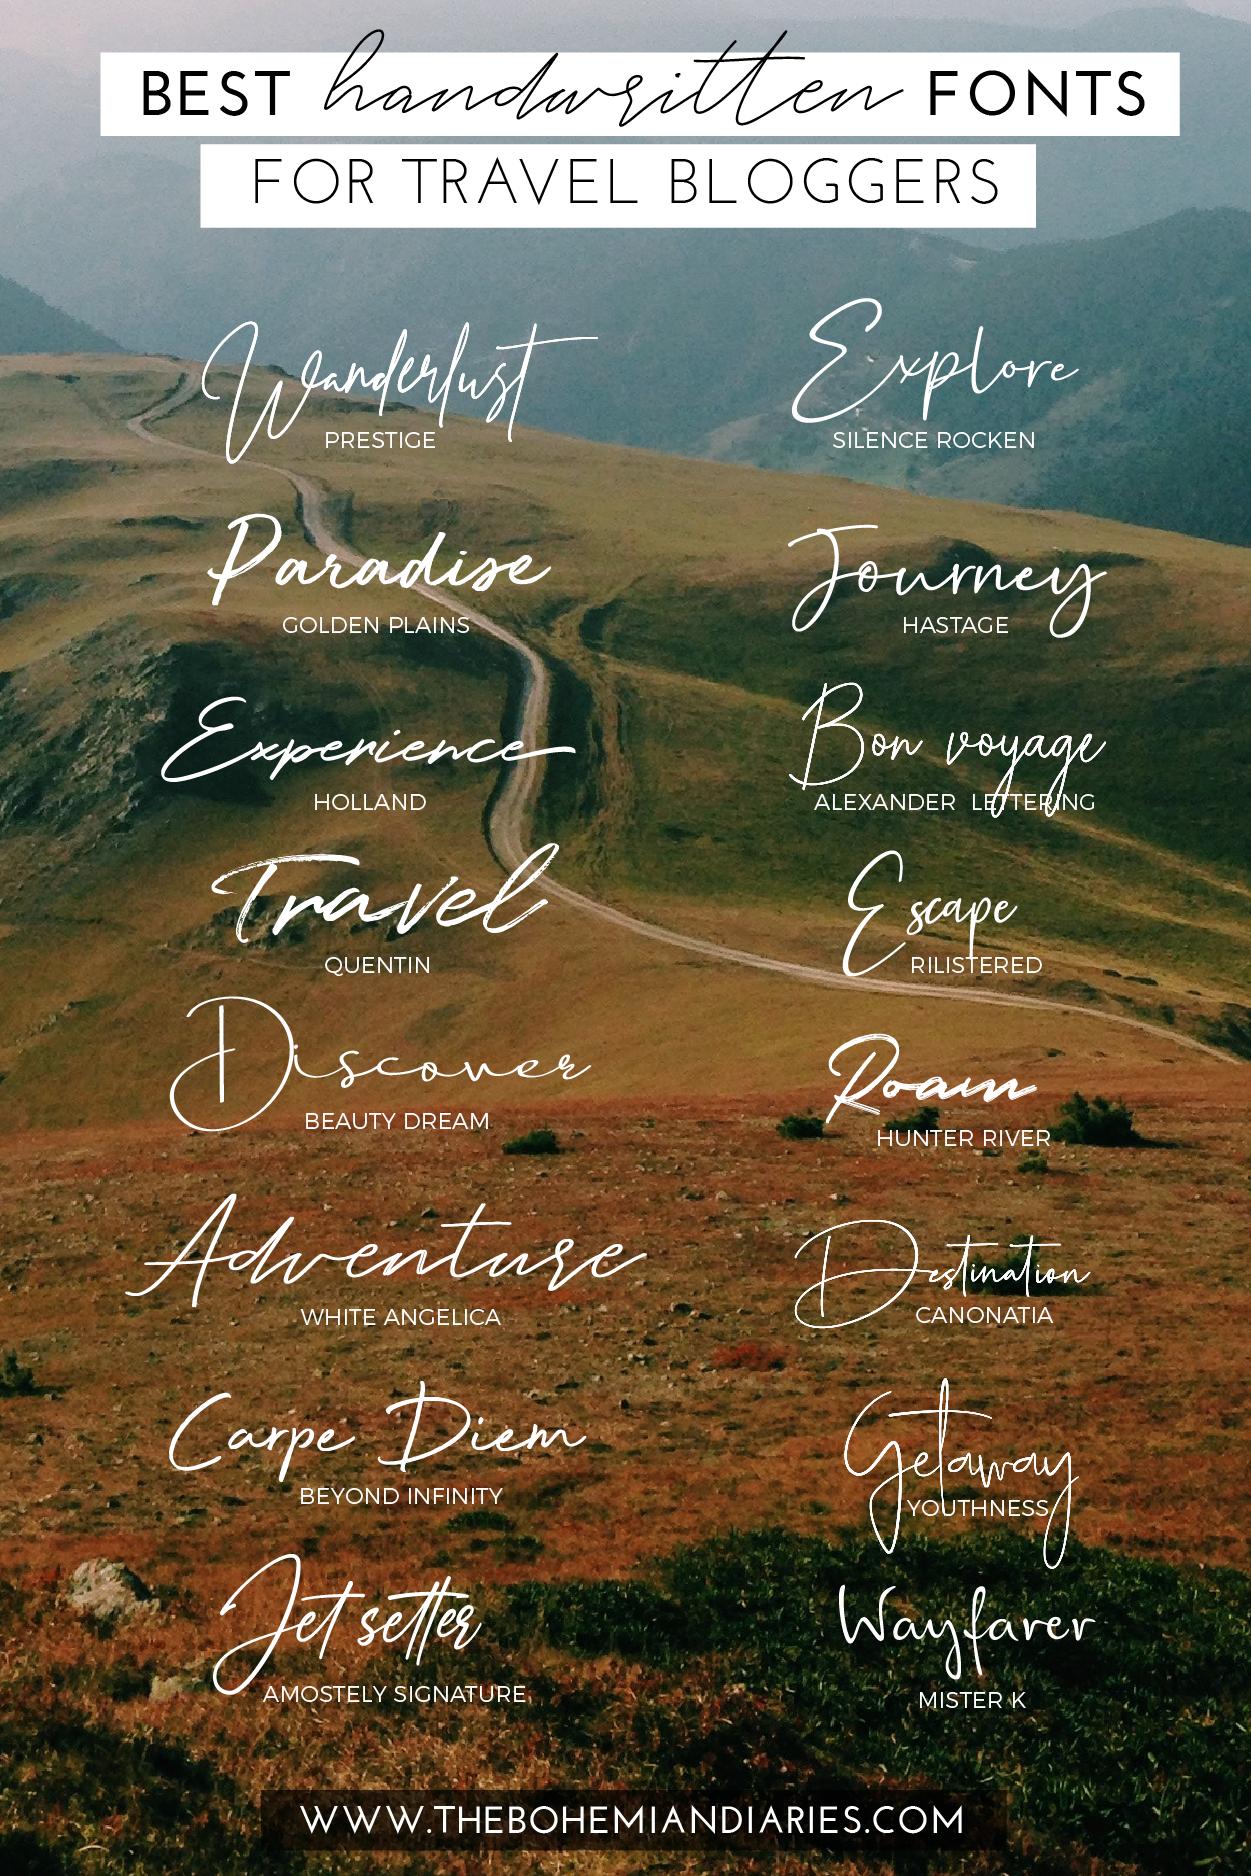 16 Free Handwritten Fonts For Bloggers In 2020 The Bohemian Diaries Handwritten Fonts Lettering Tutorial Fonts Free Handwritten Fonts